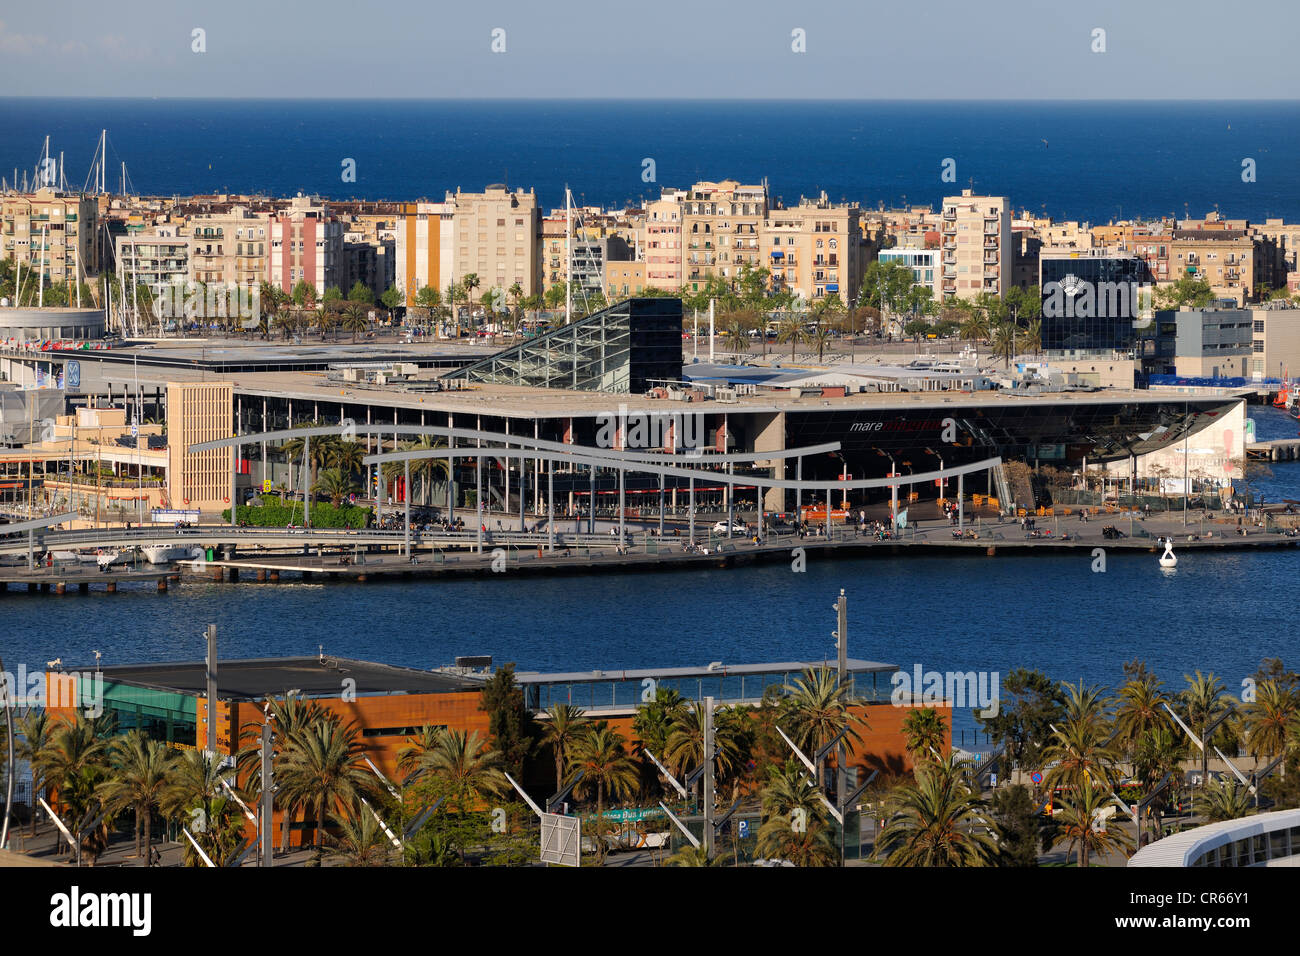 Spain, Catalonia, Barcelona, Port Vell (Old Port), Rambla del Mar Footbridges by architects Helio Pinon and Albert - Stock Image